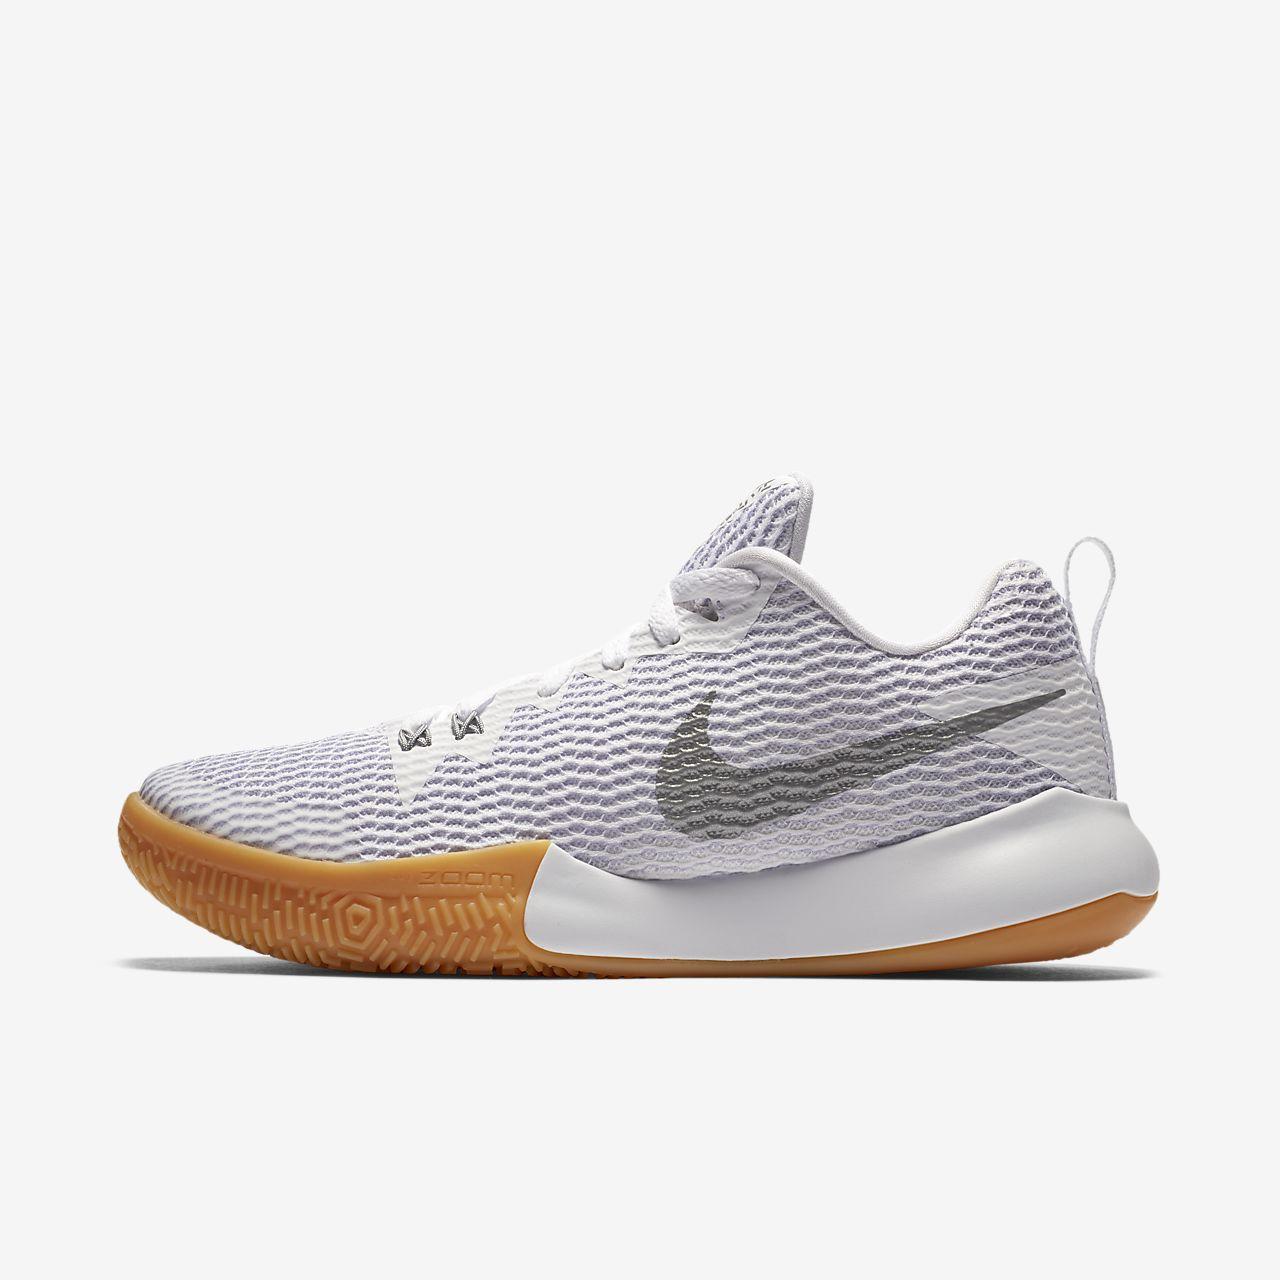 Scarpa da basket Nike Zoom Live II - Donna